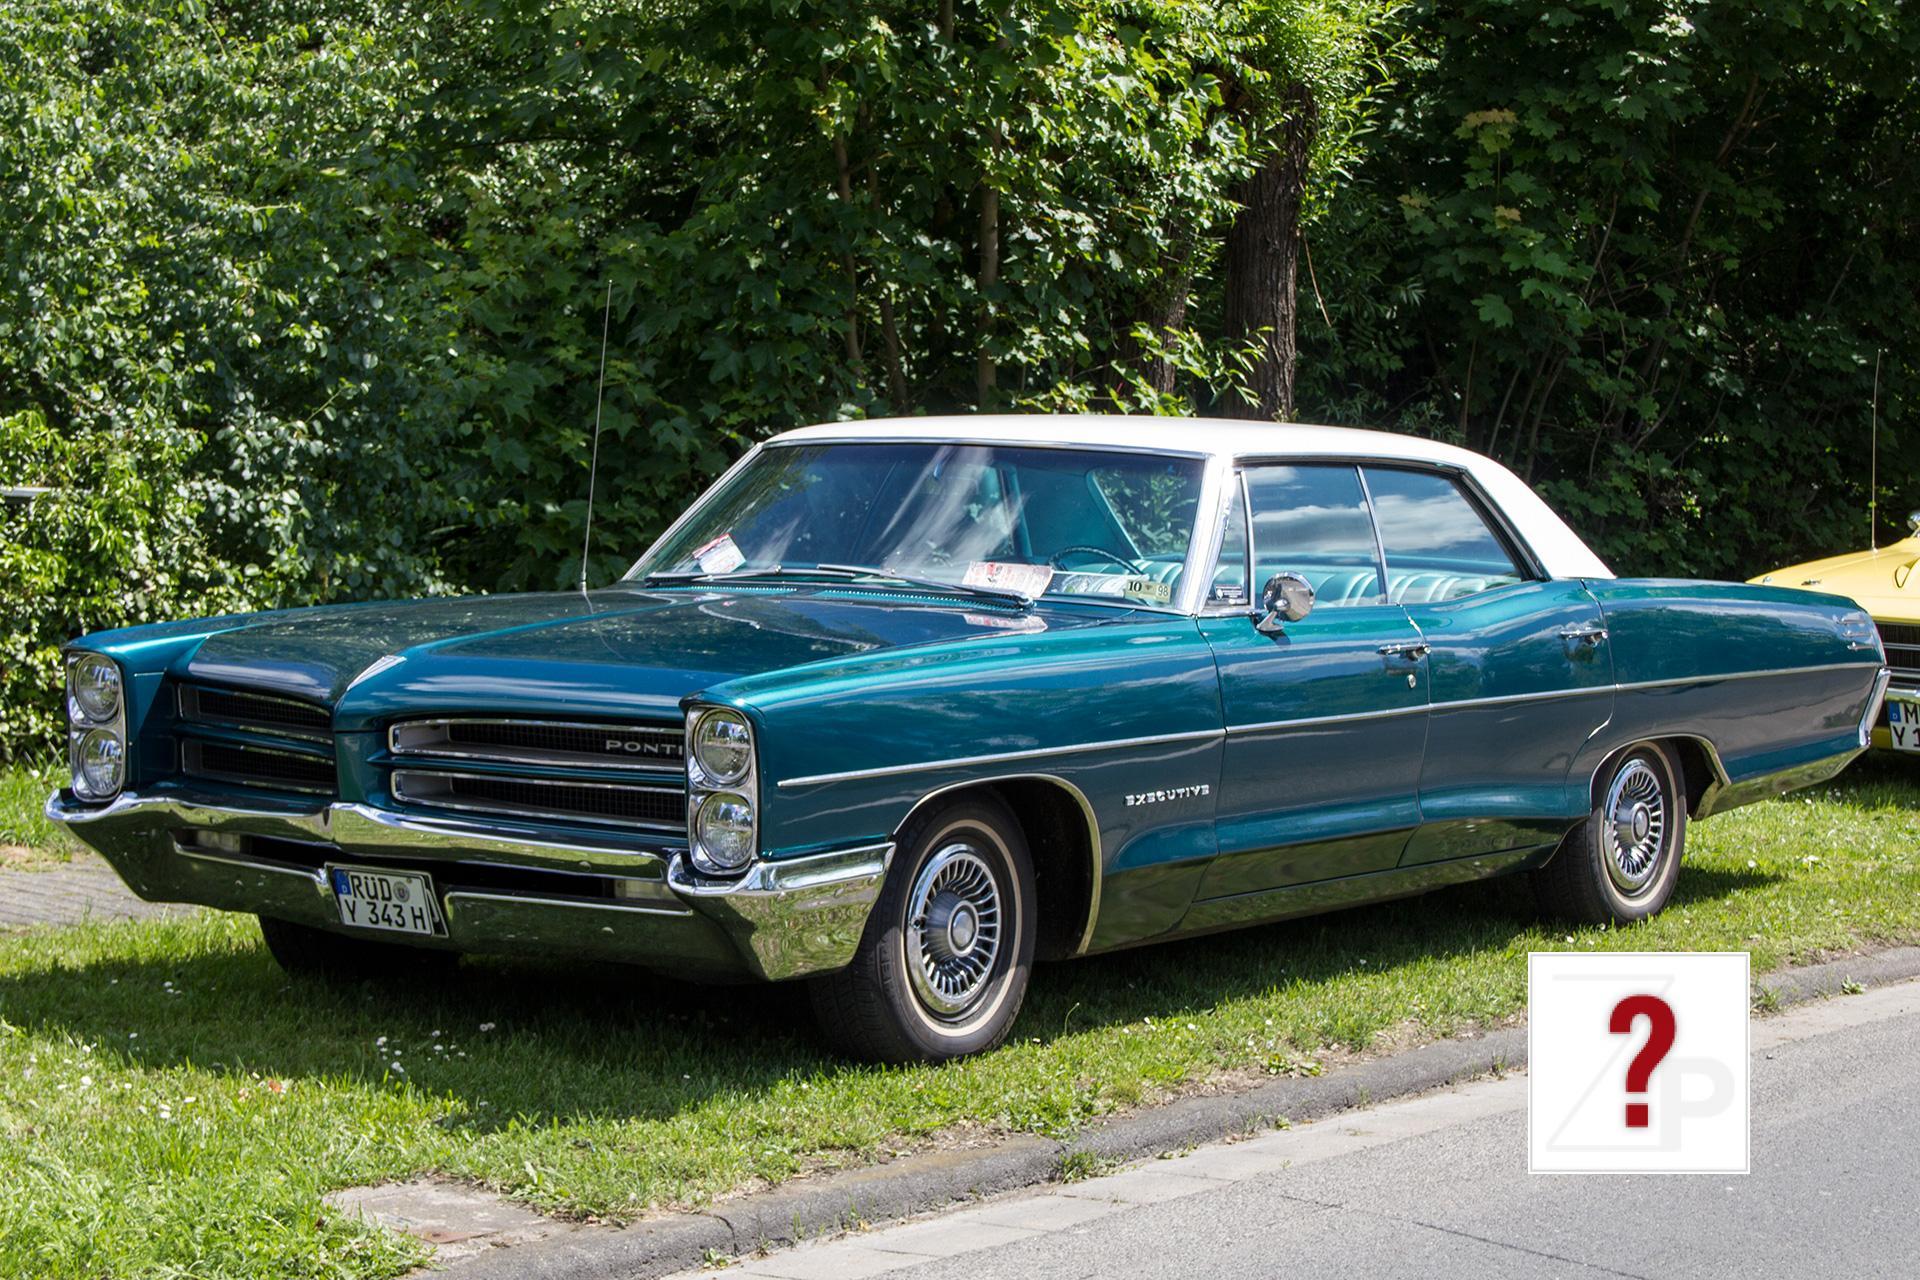 1966 Pontiac Star Chief Executive Sedan Front View